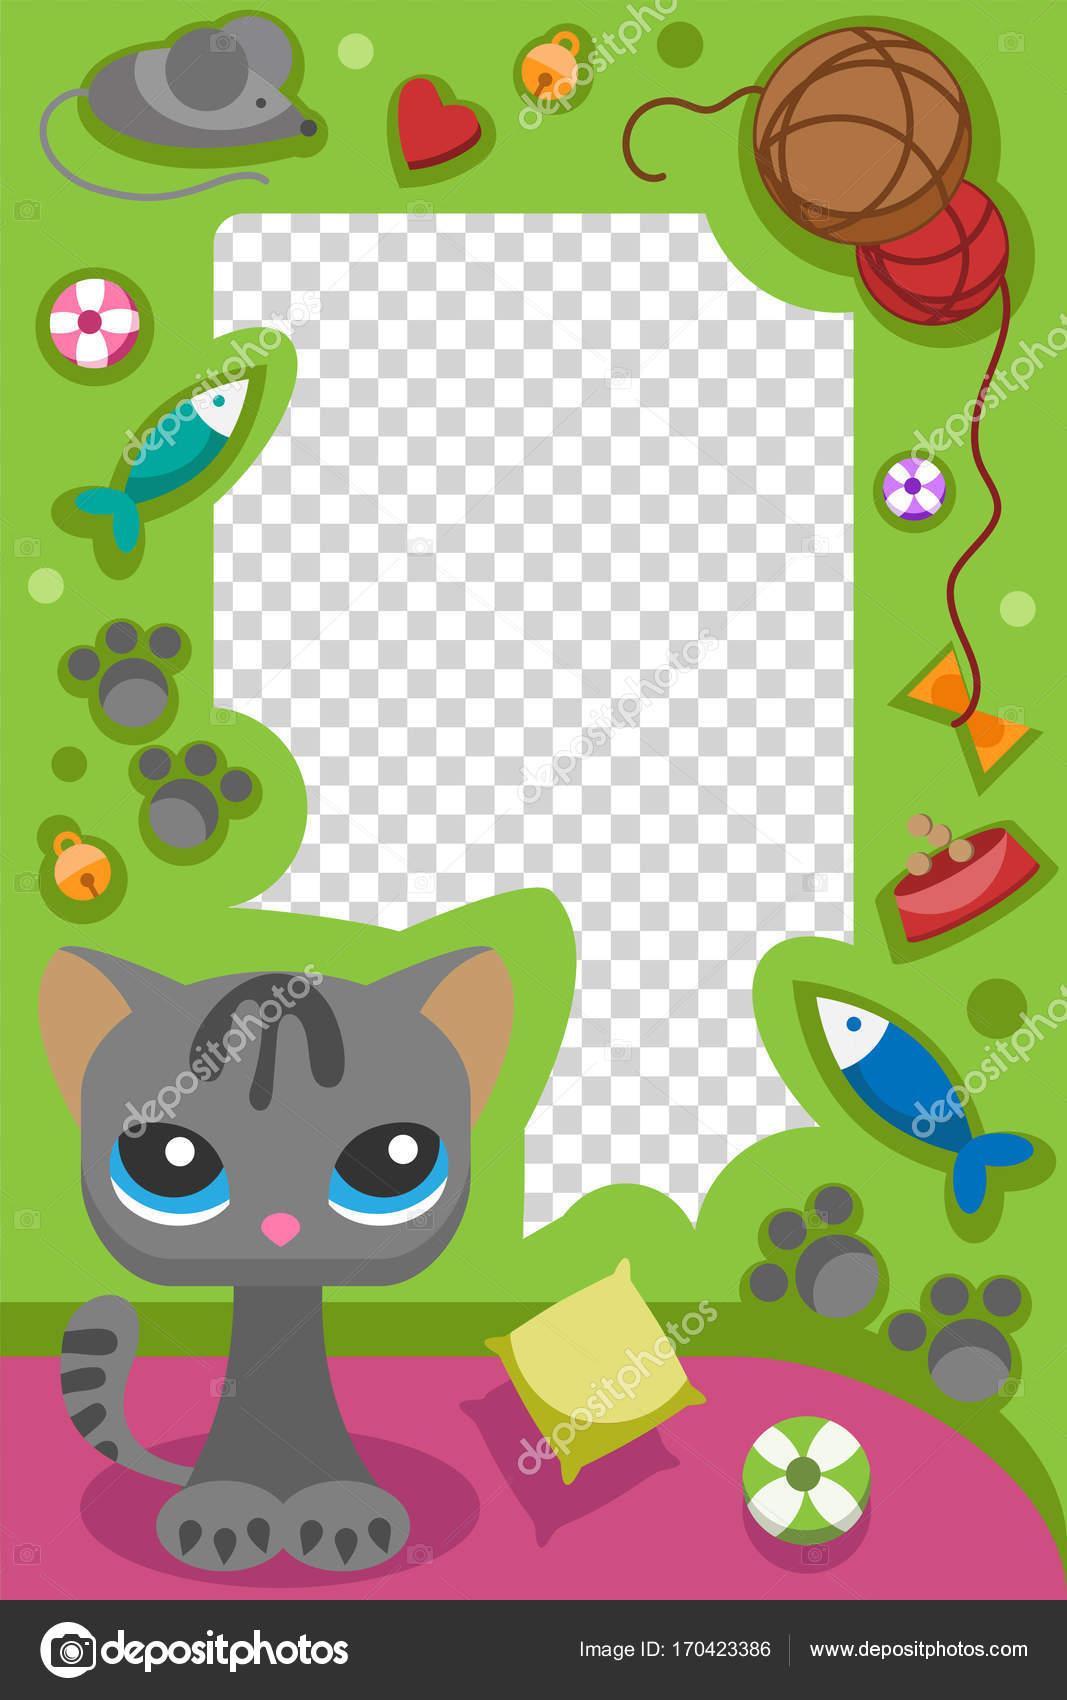 Cute Happy Birthday Cat Photo Frame Design Baby Kitty Celebration Vector Illustration Stock